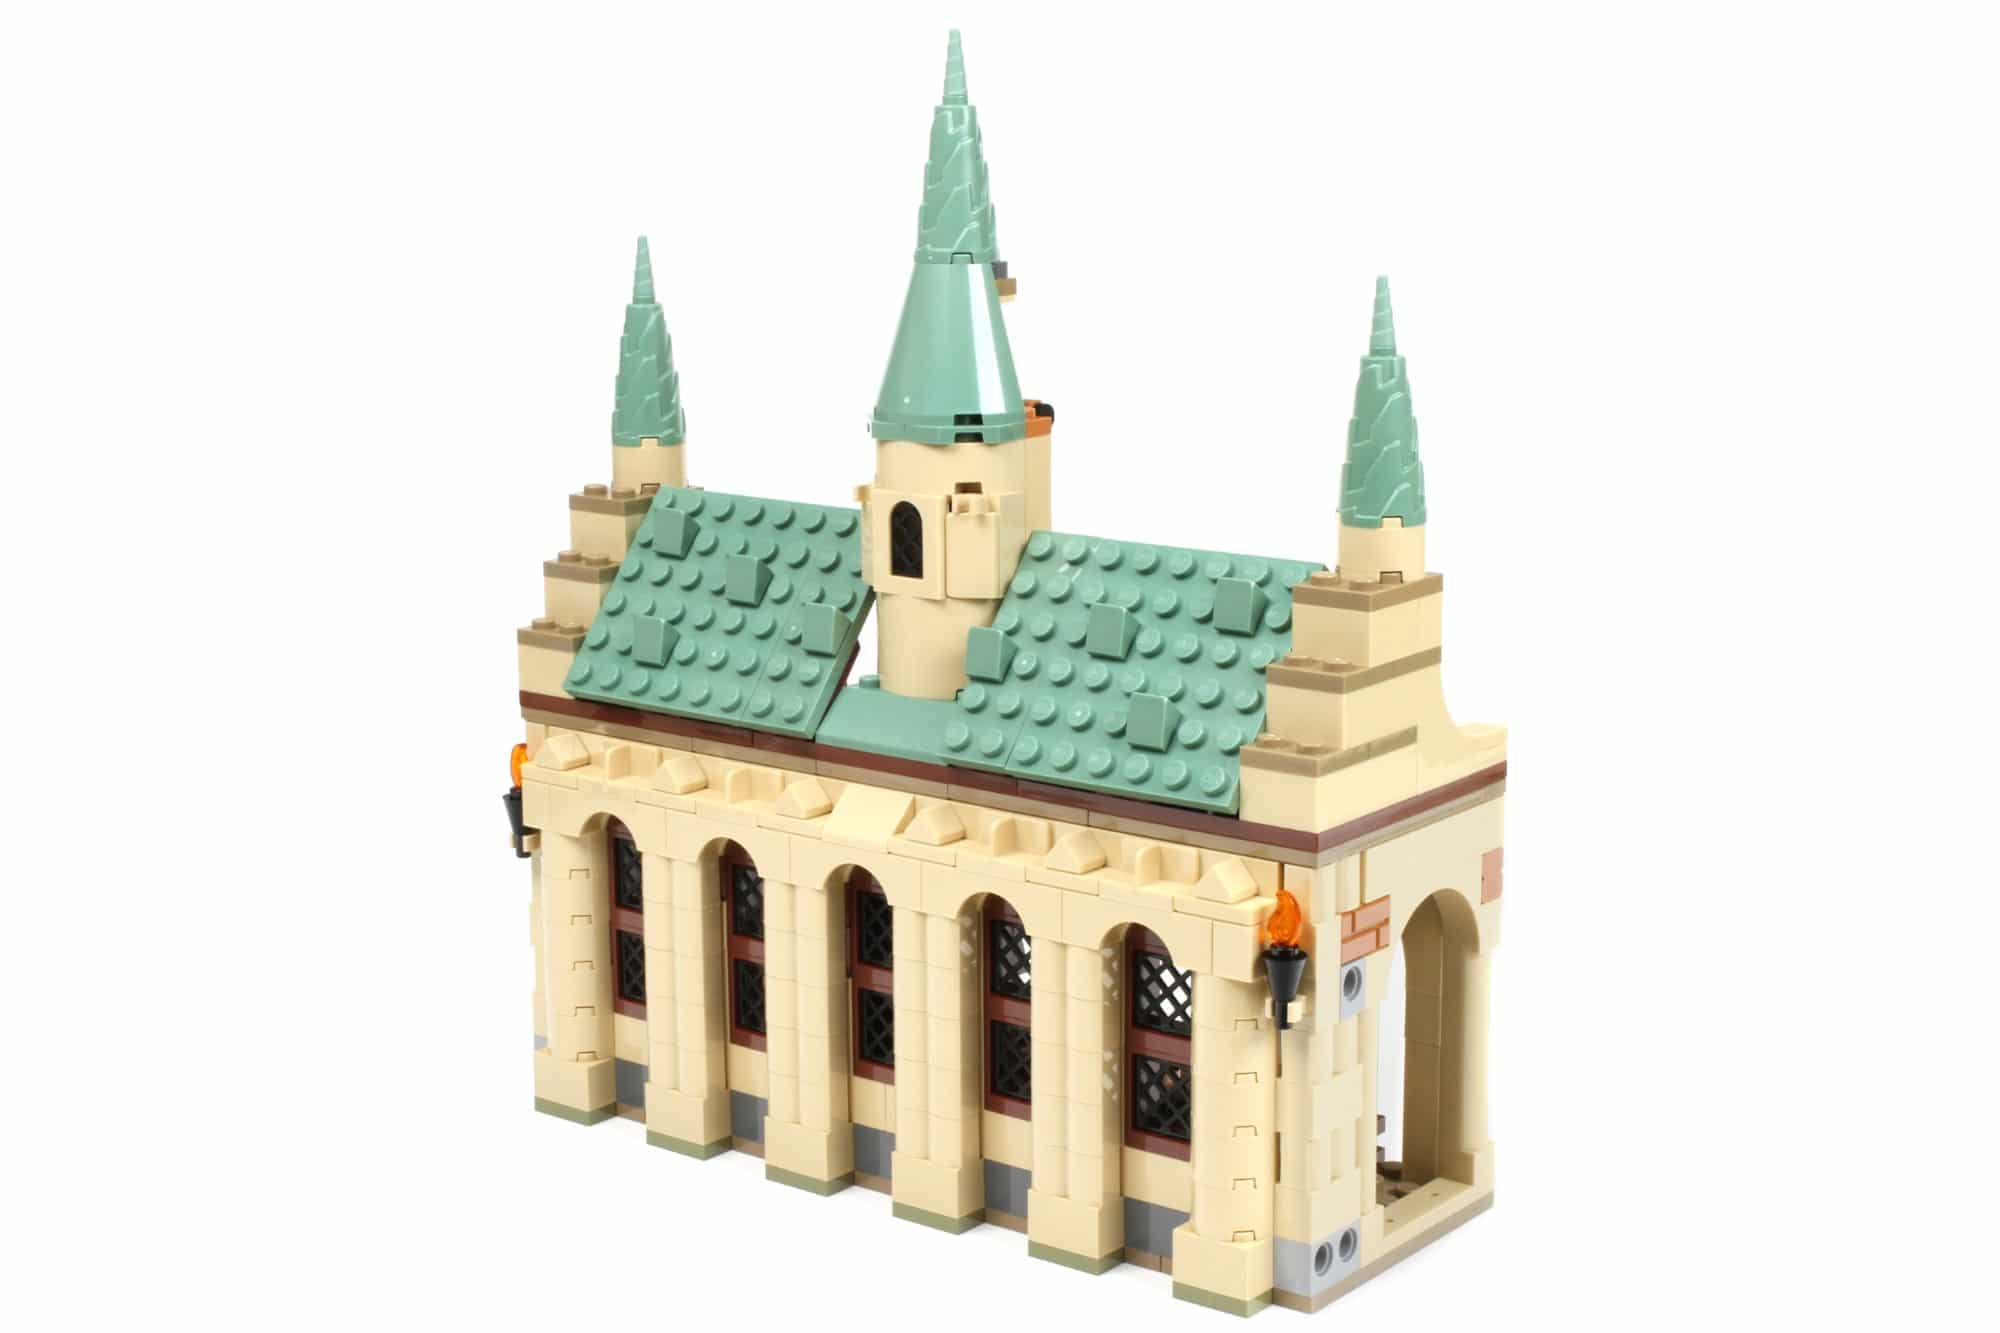 LEGO Harry Potter 76389 Hogwarts Kammer Des Schreckens Schritt 5 6